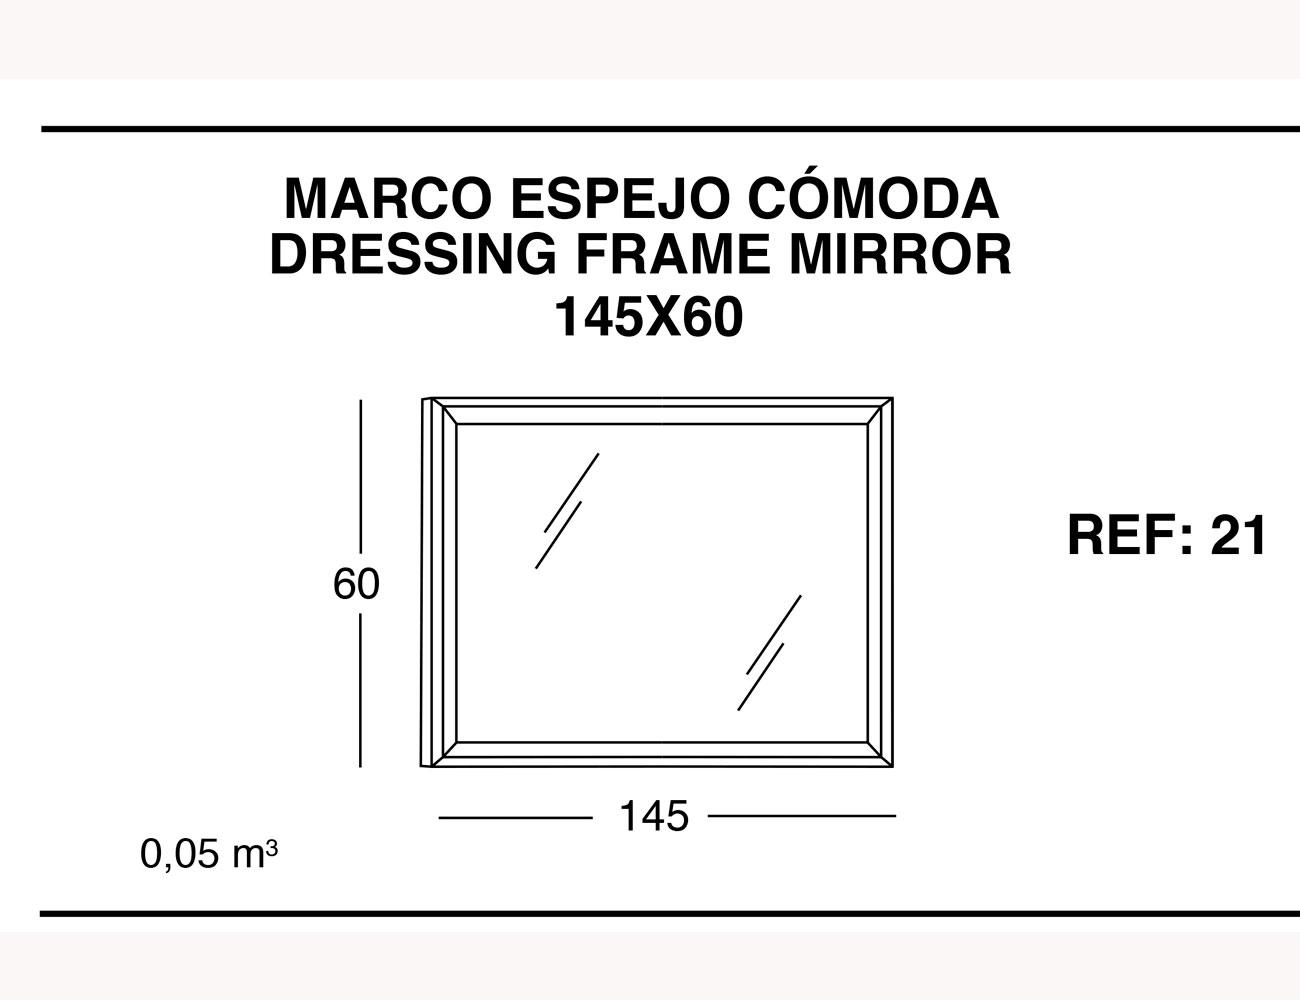 Marco espejo comoda 145 60